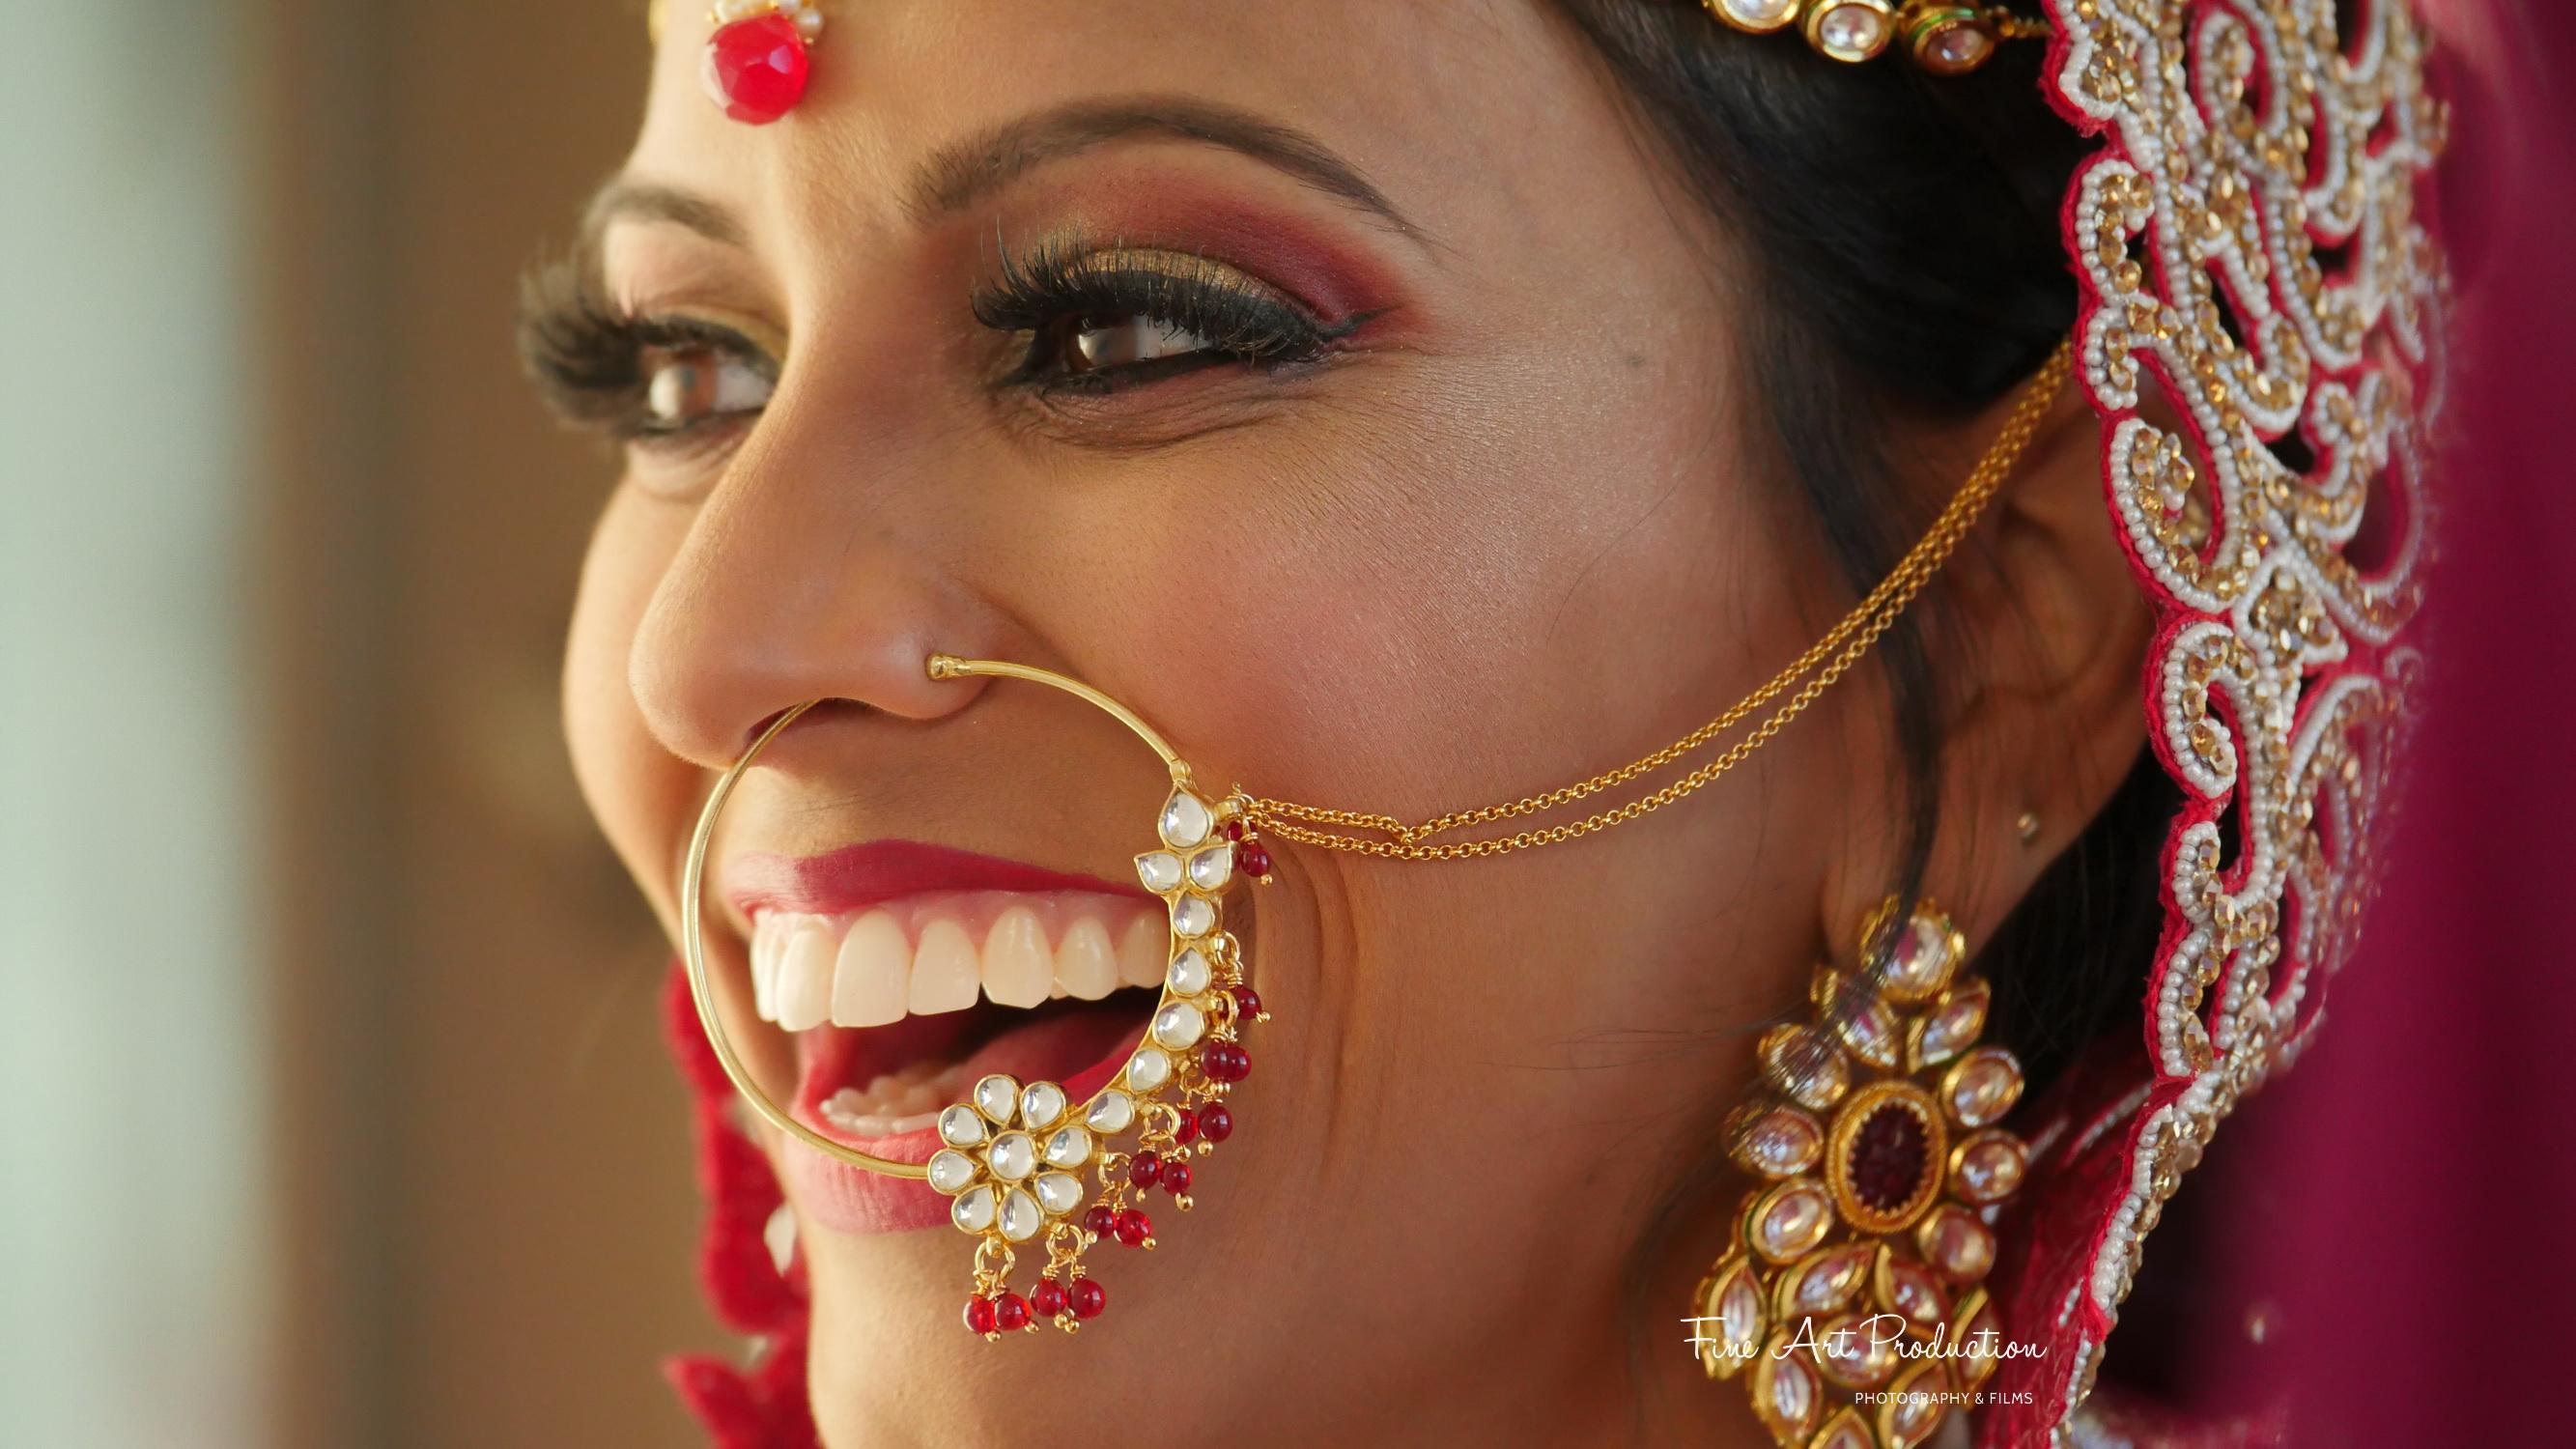 india-wedding-photographer-fine-art-production-chirali-amish-thakkar_0134